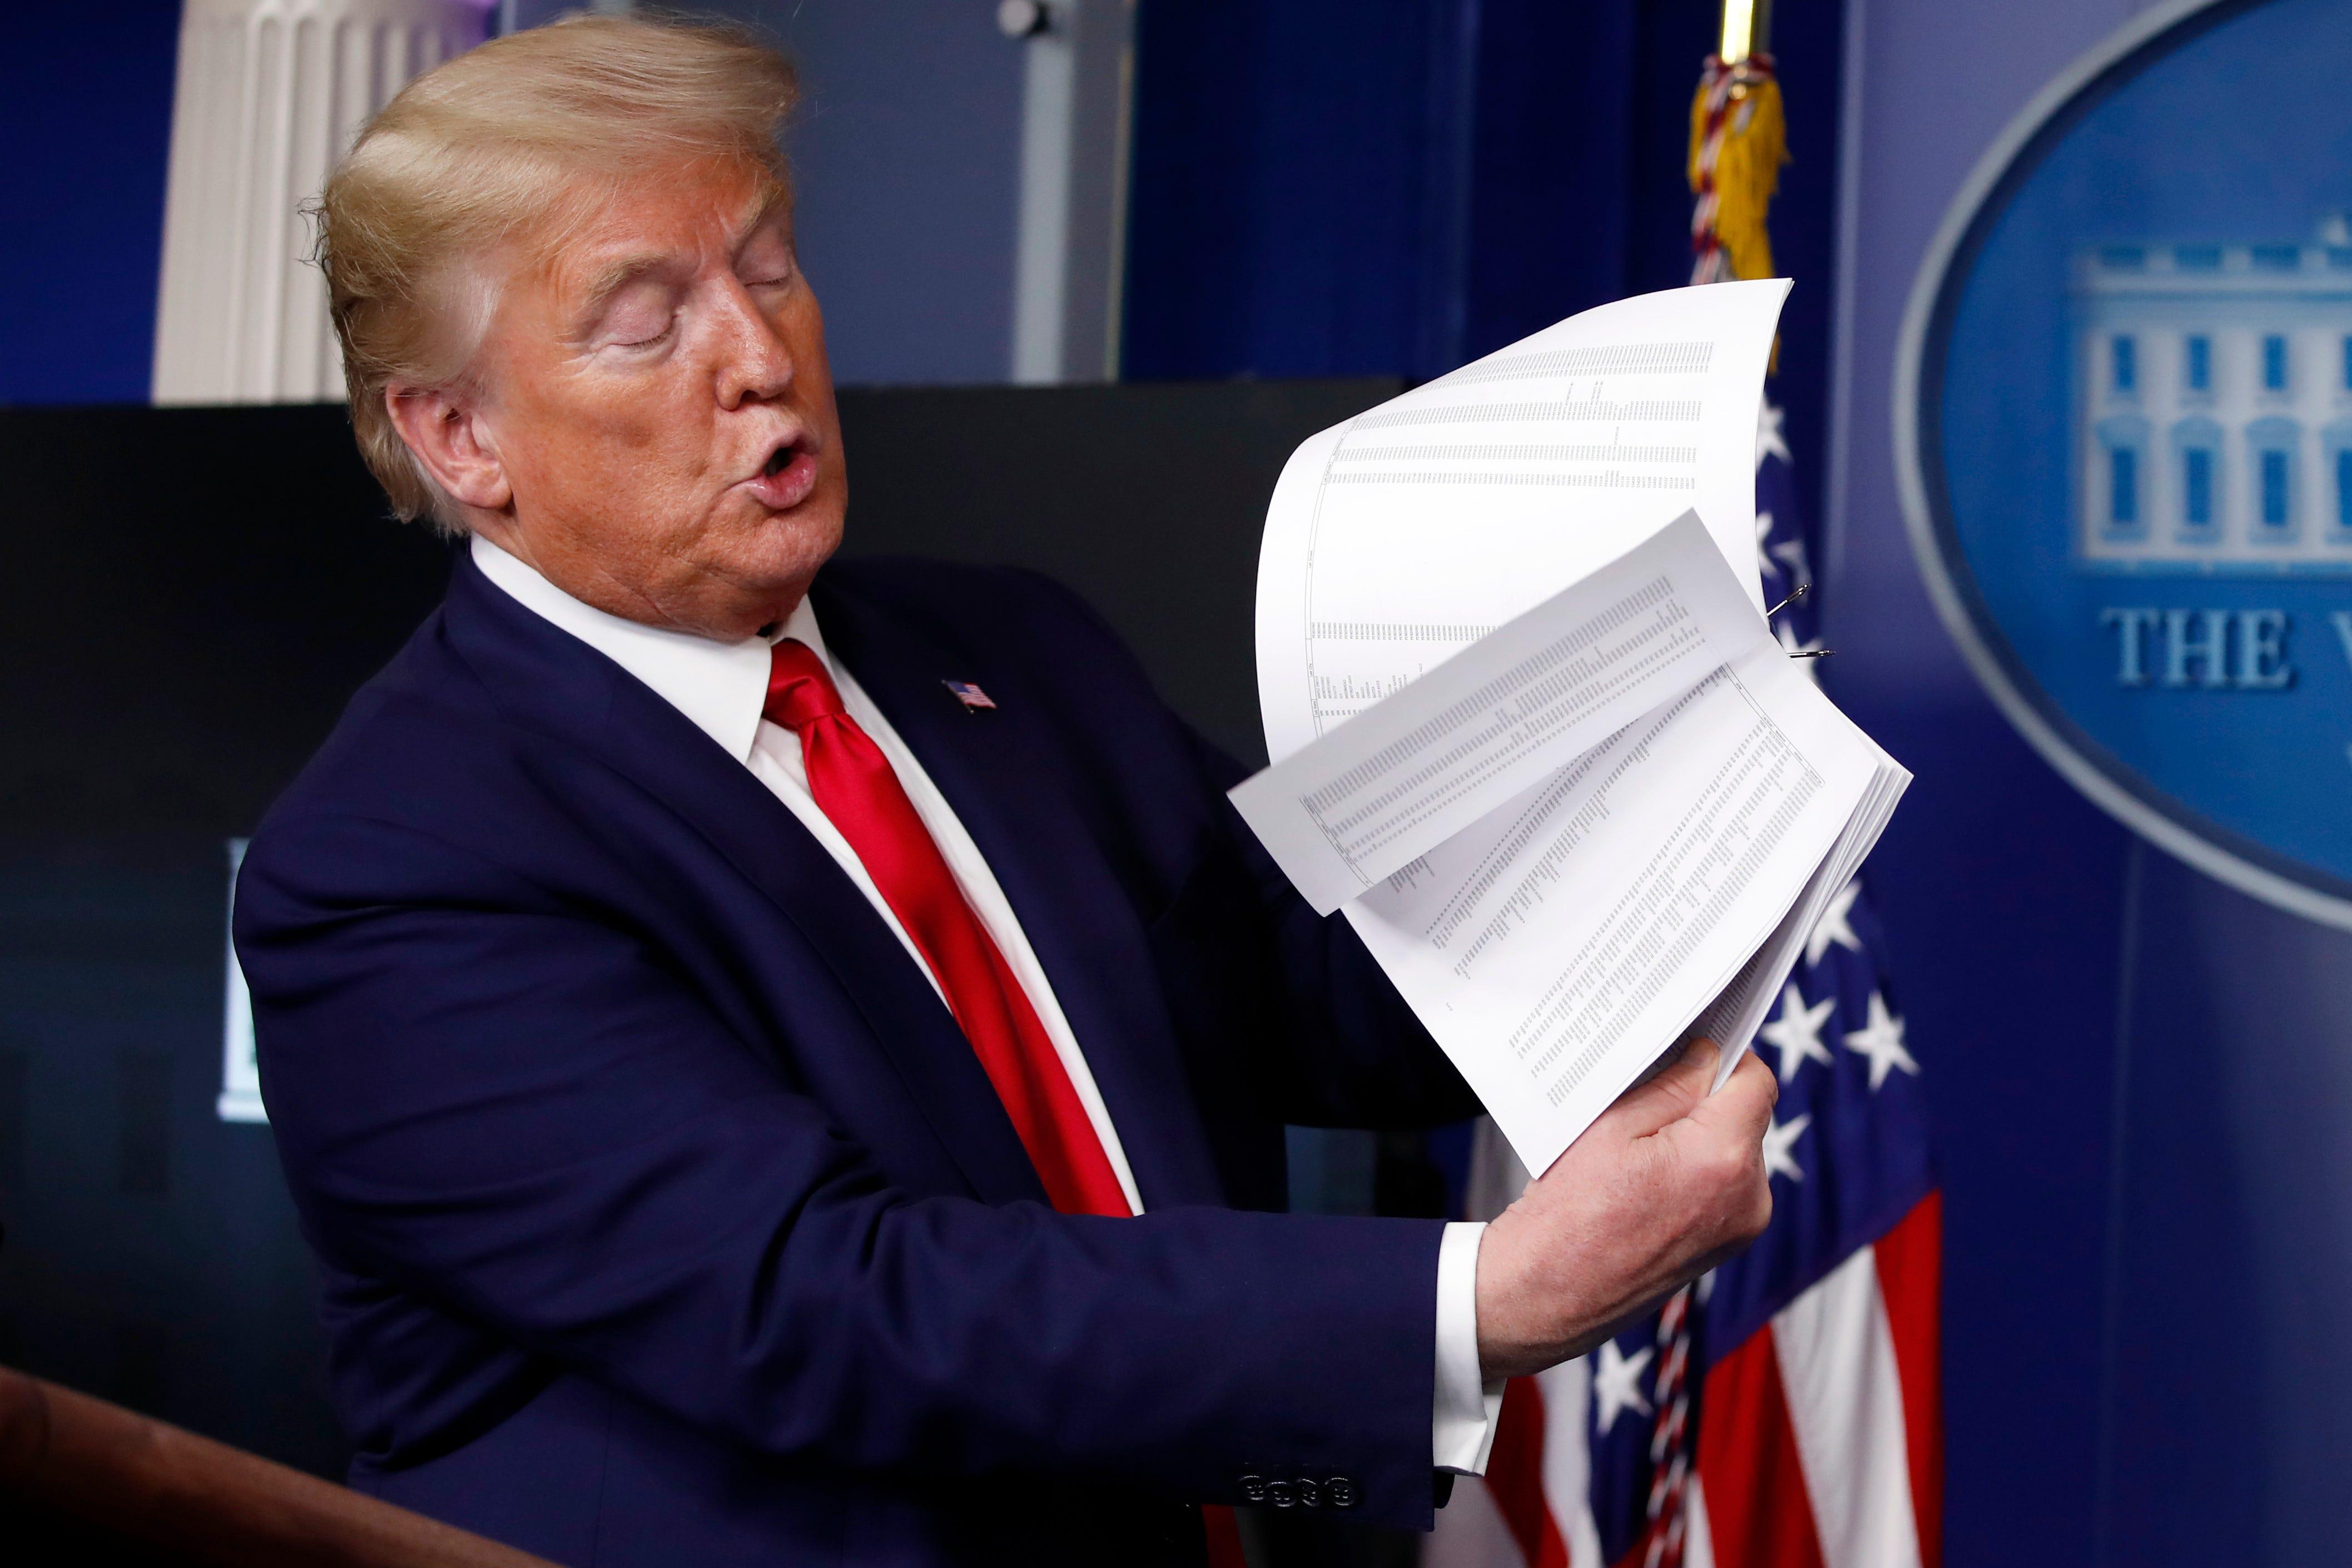 Coronavirus live updates: Immigration suspension; Cuomo to visit Trump; States reveal reopening plans